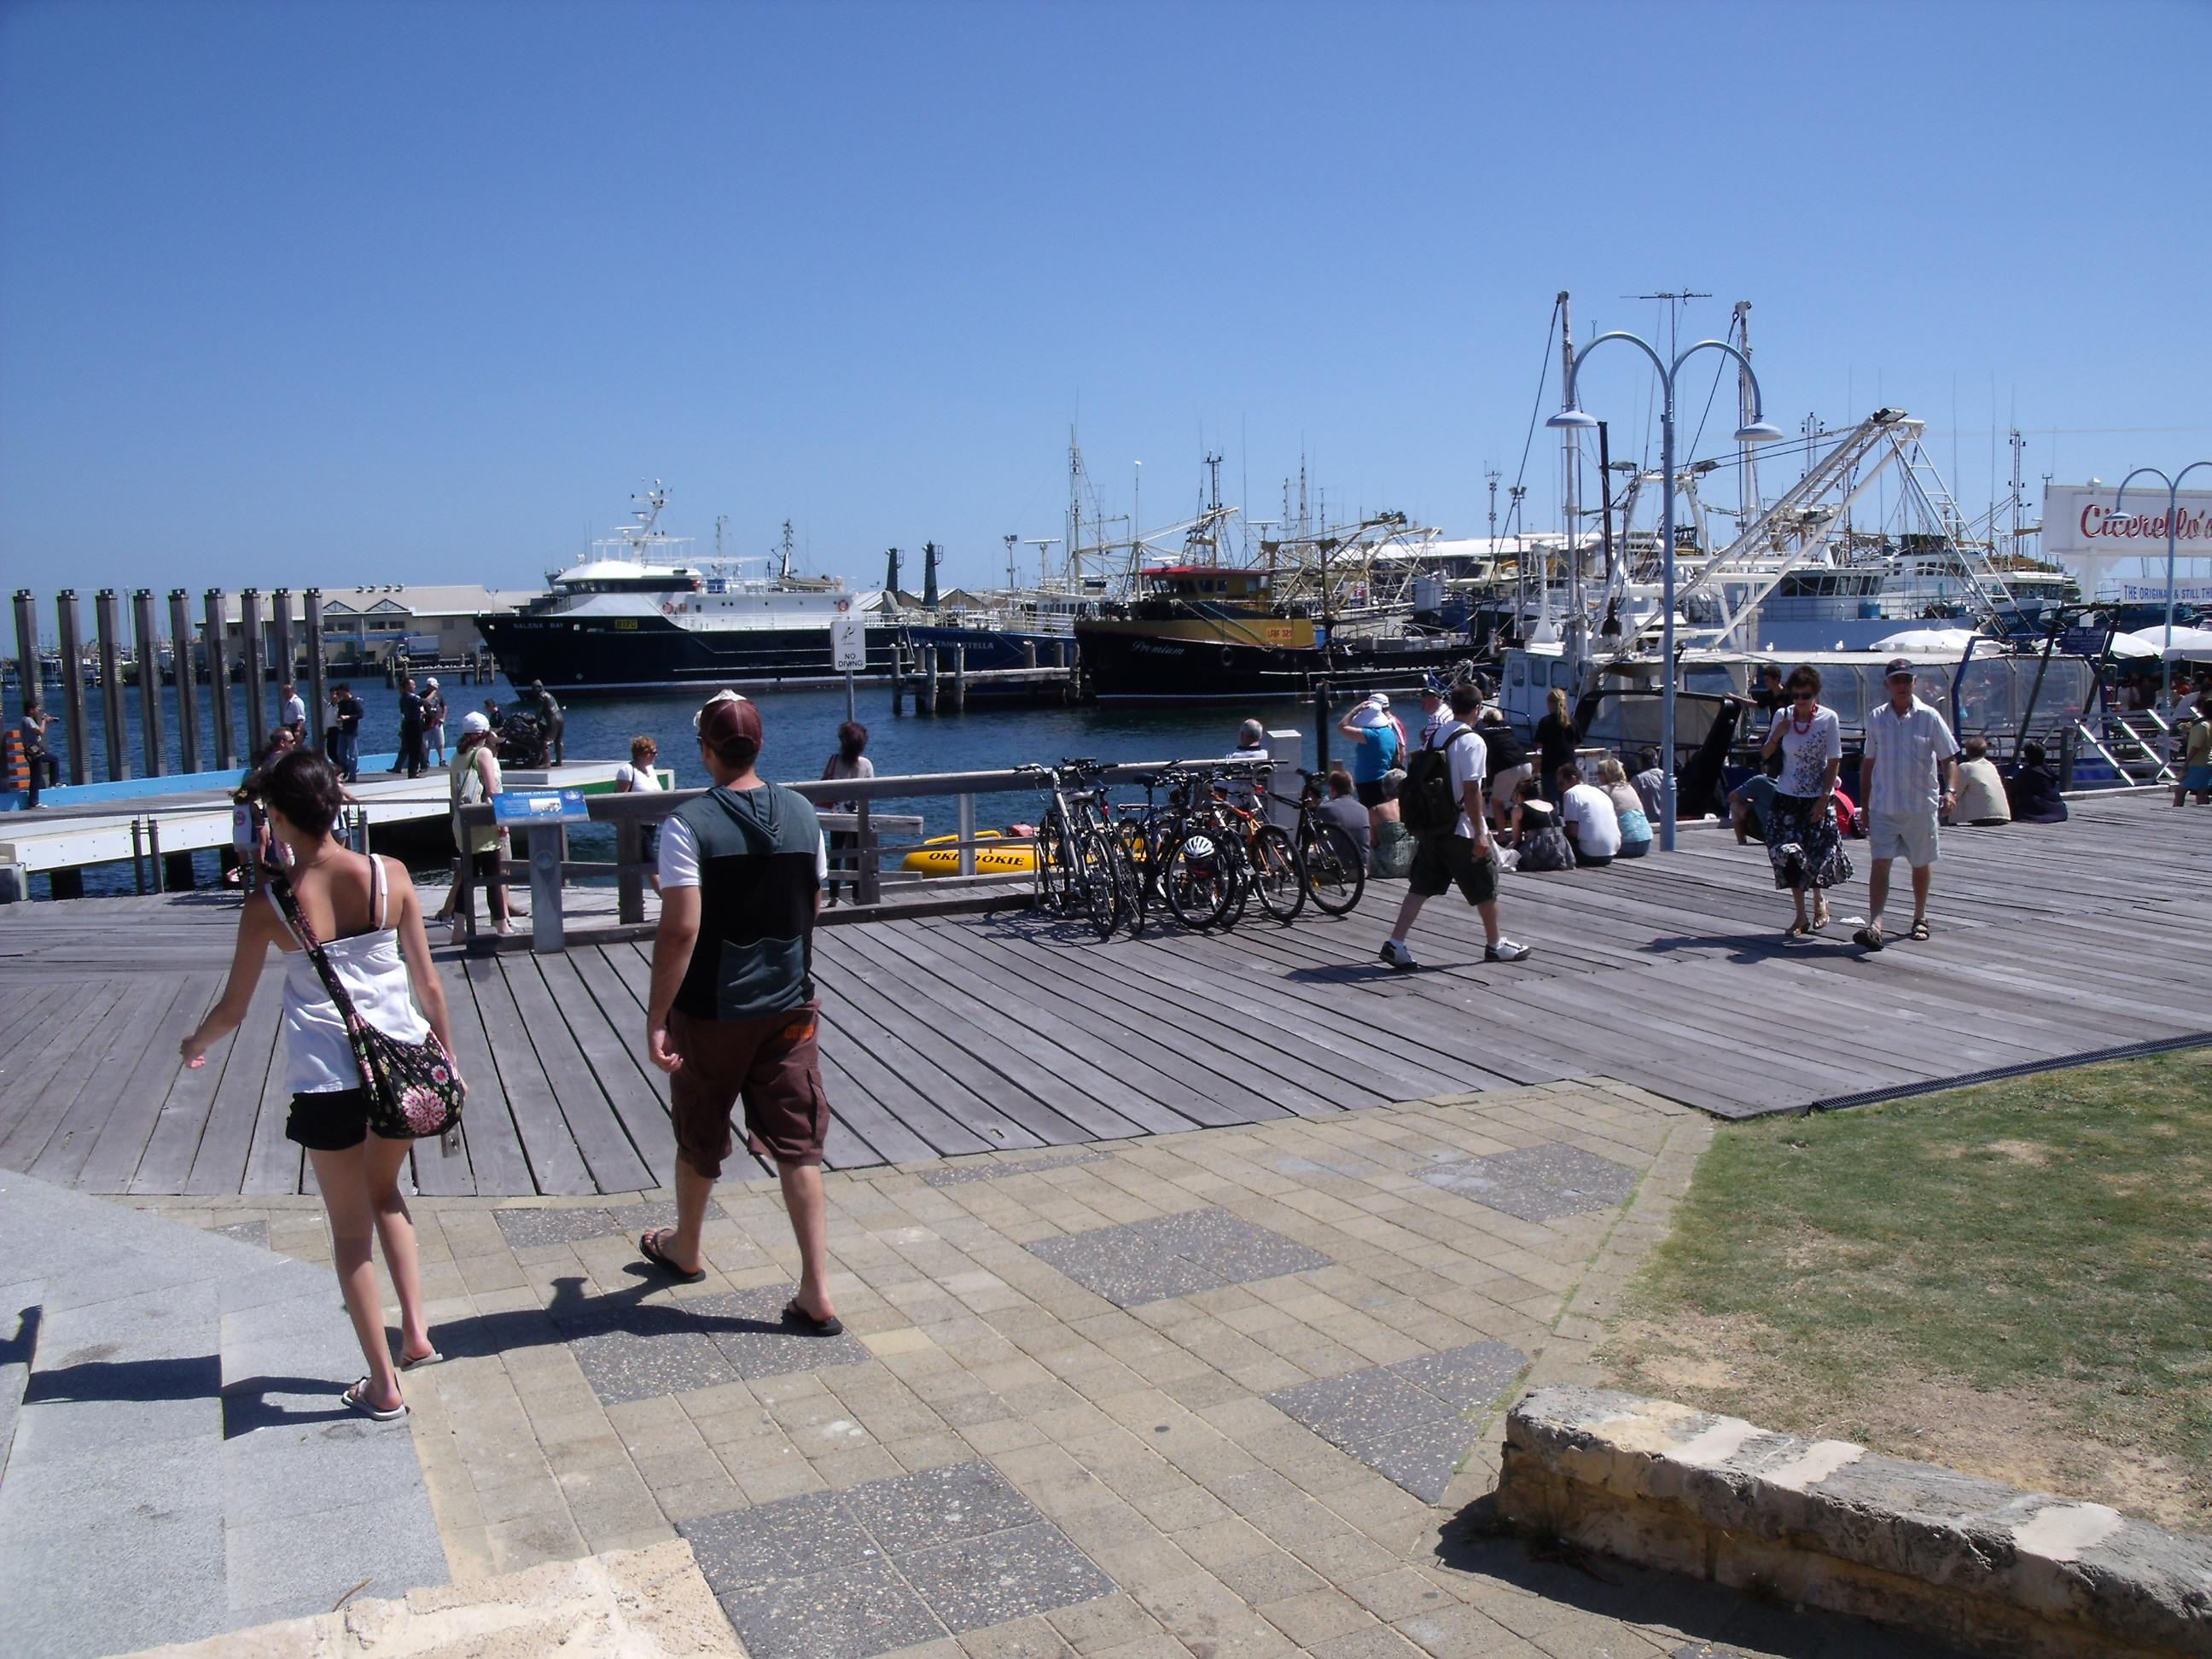 Great fishing spots around western australia alpha car hire for Fishing spots near me no boat